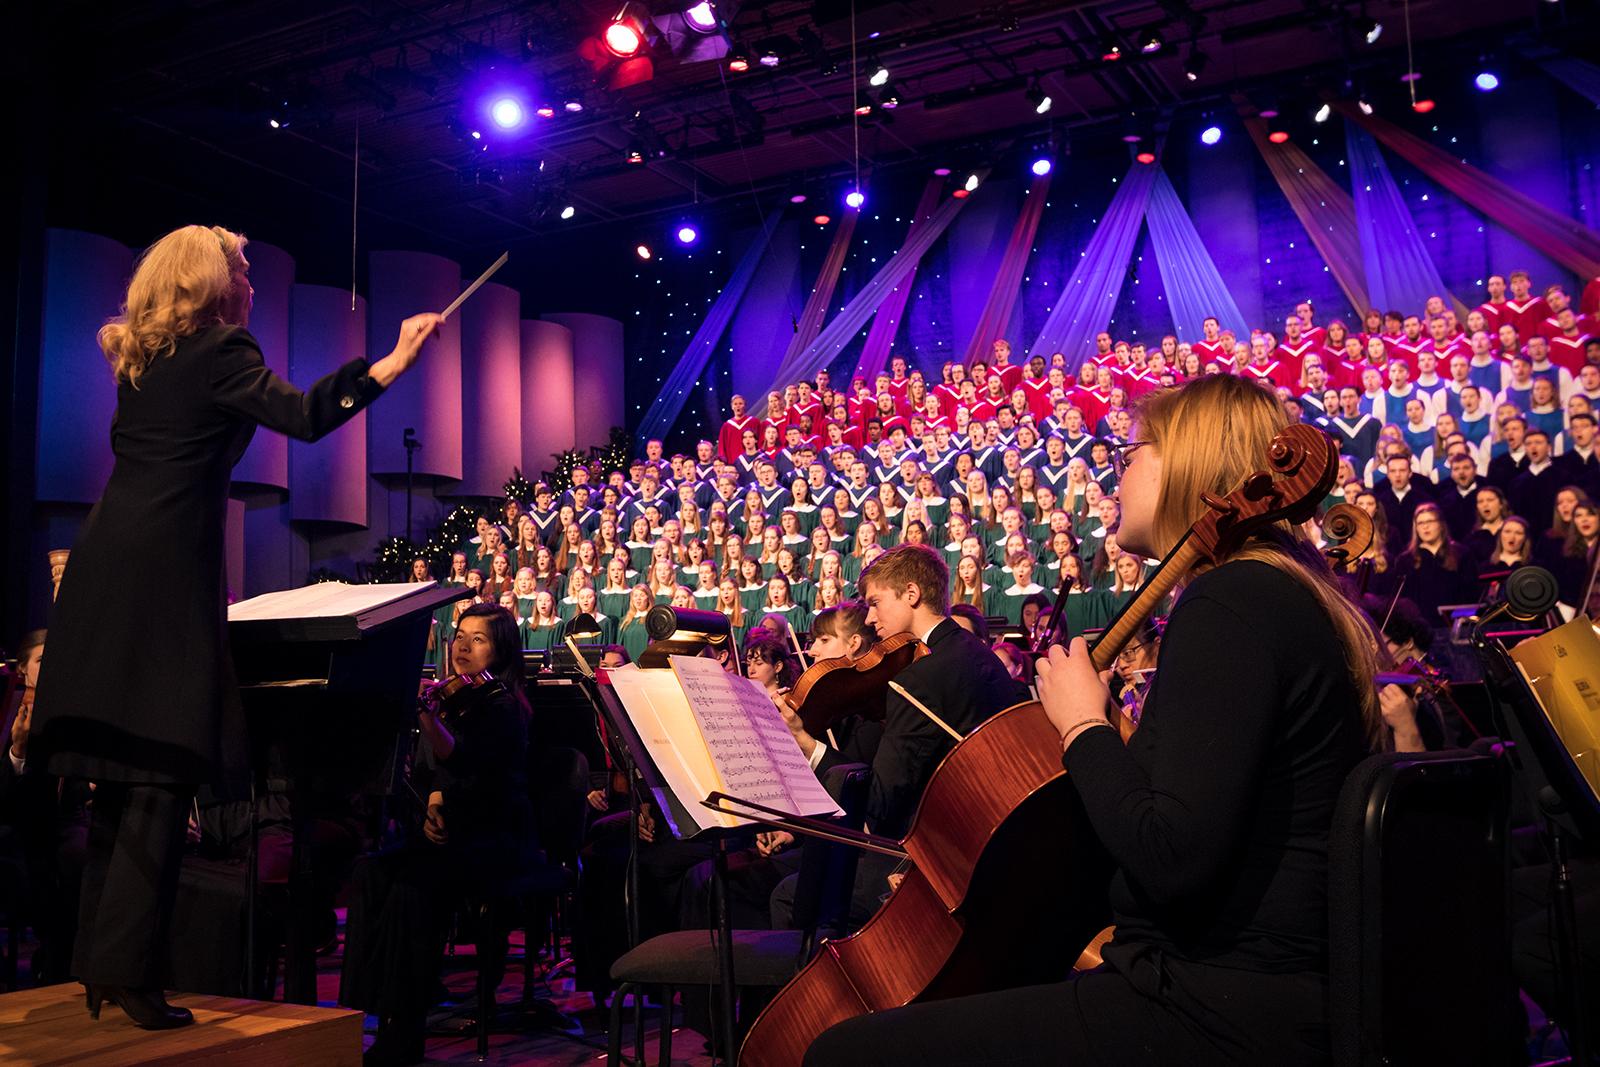 Broadcast 2020 St. Olaf Christmas Festival St. Olaf celebrates the season with annual Christmas Festival – St